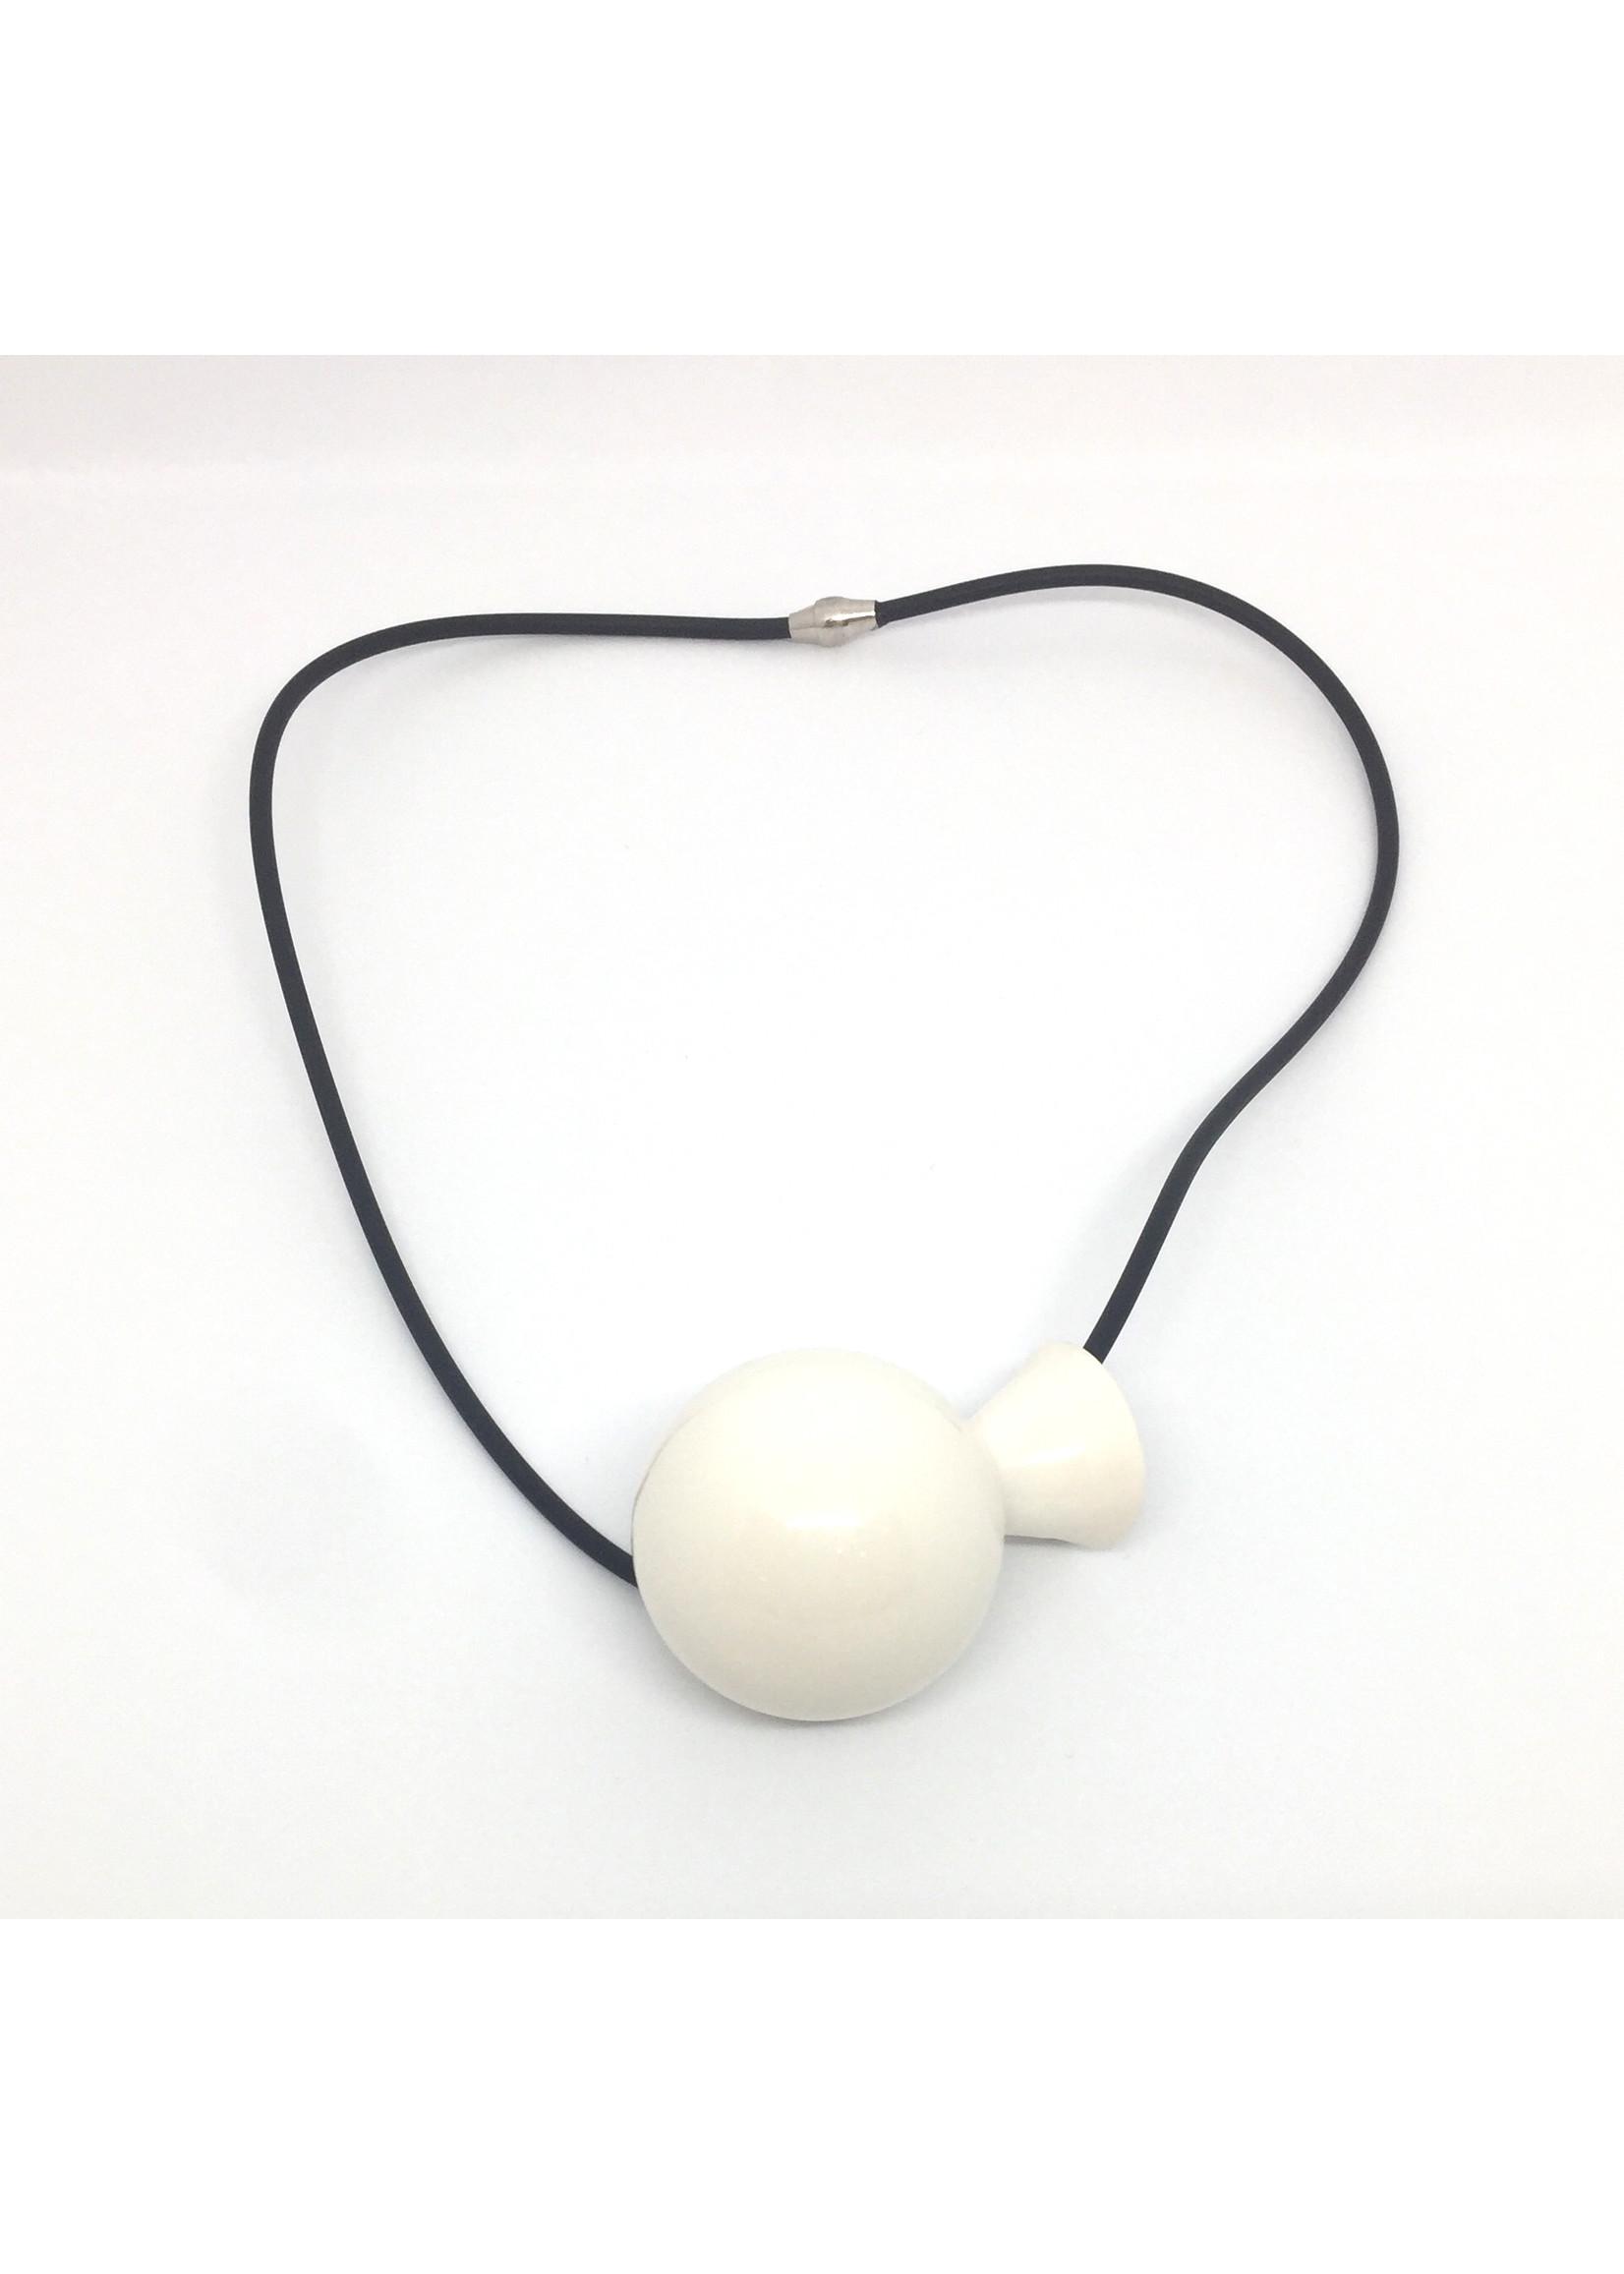 Necklace by Harry Agema 'Vase'